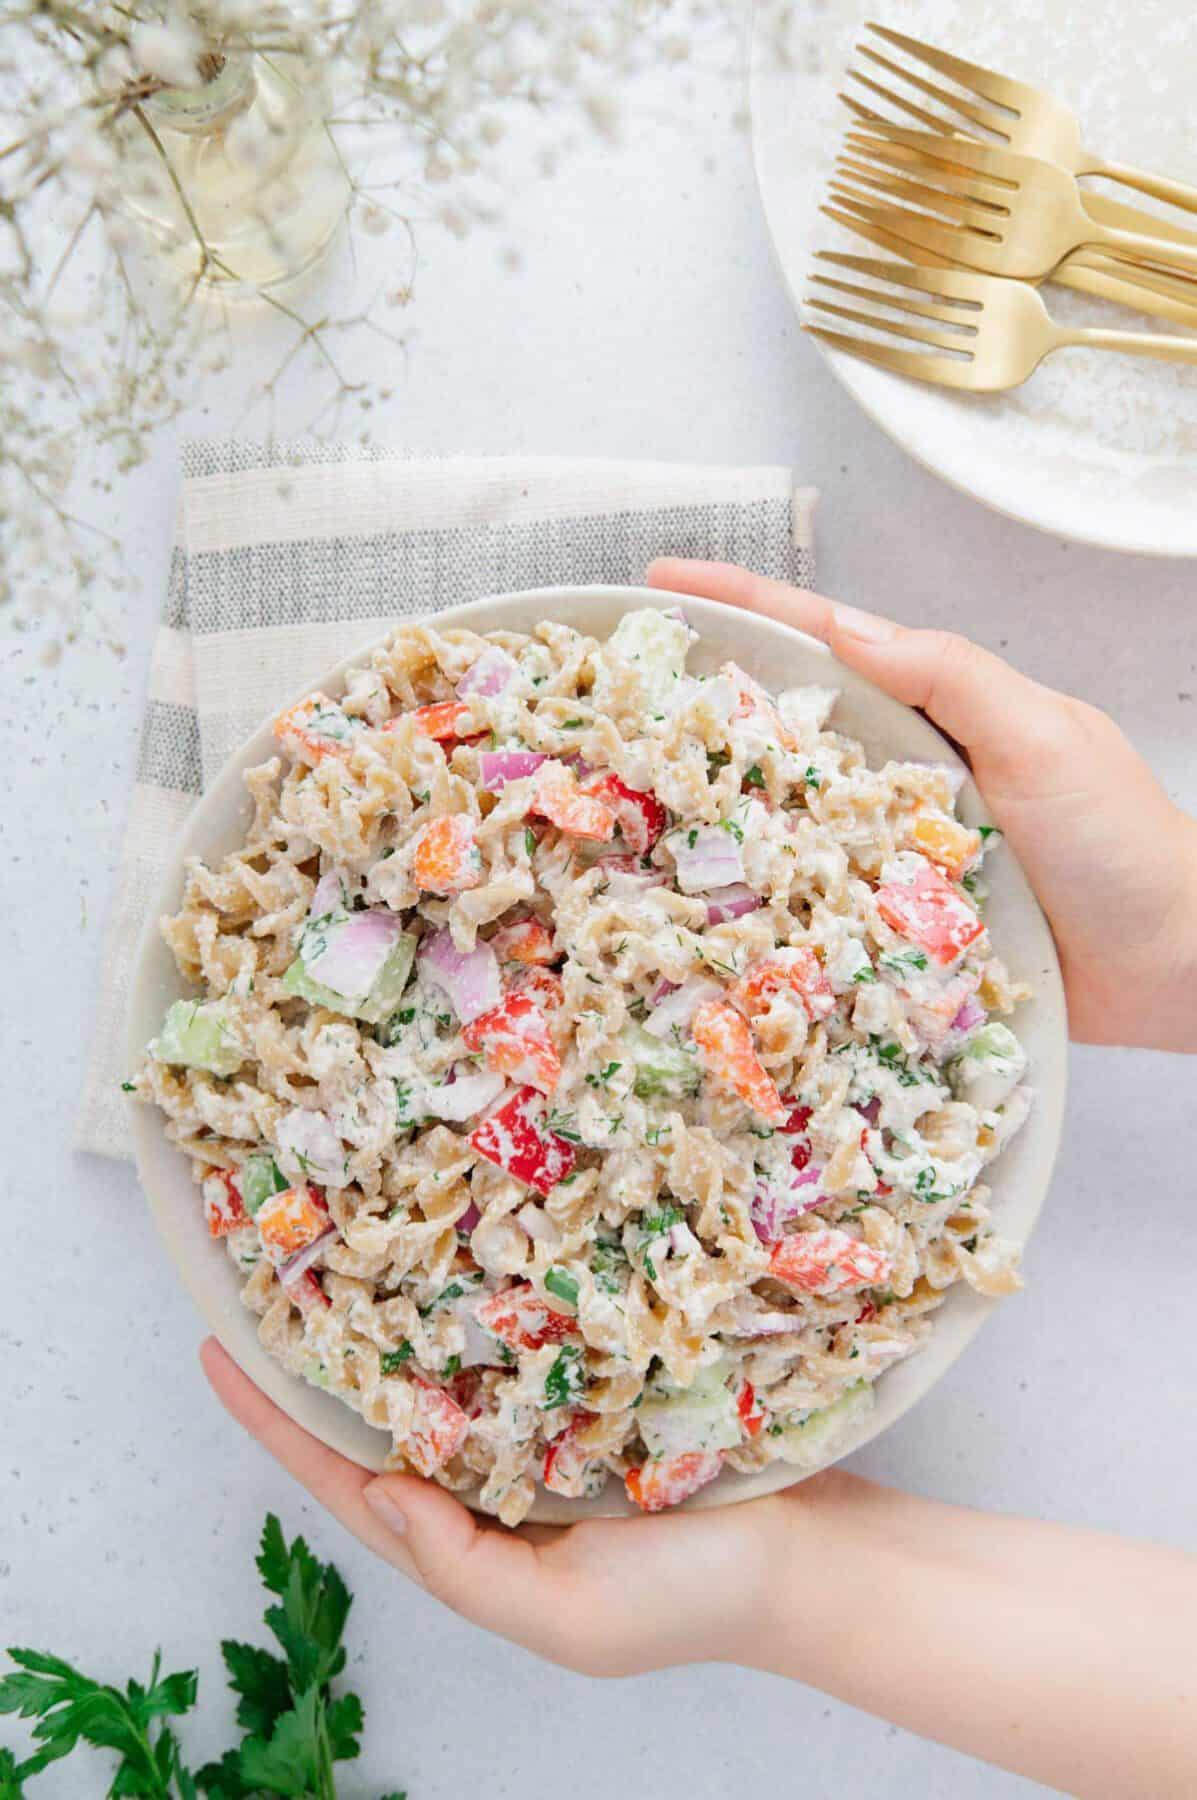 Vegan Picnic Pasta Salad